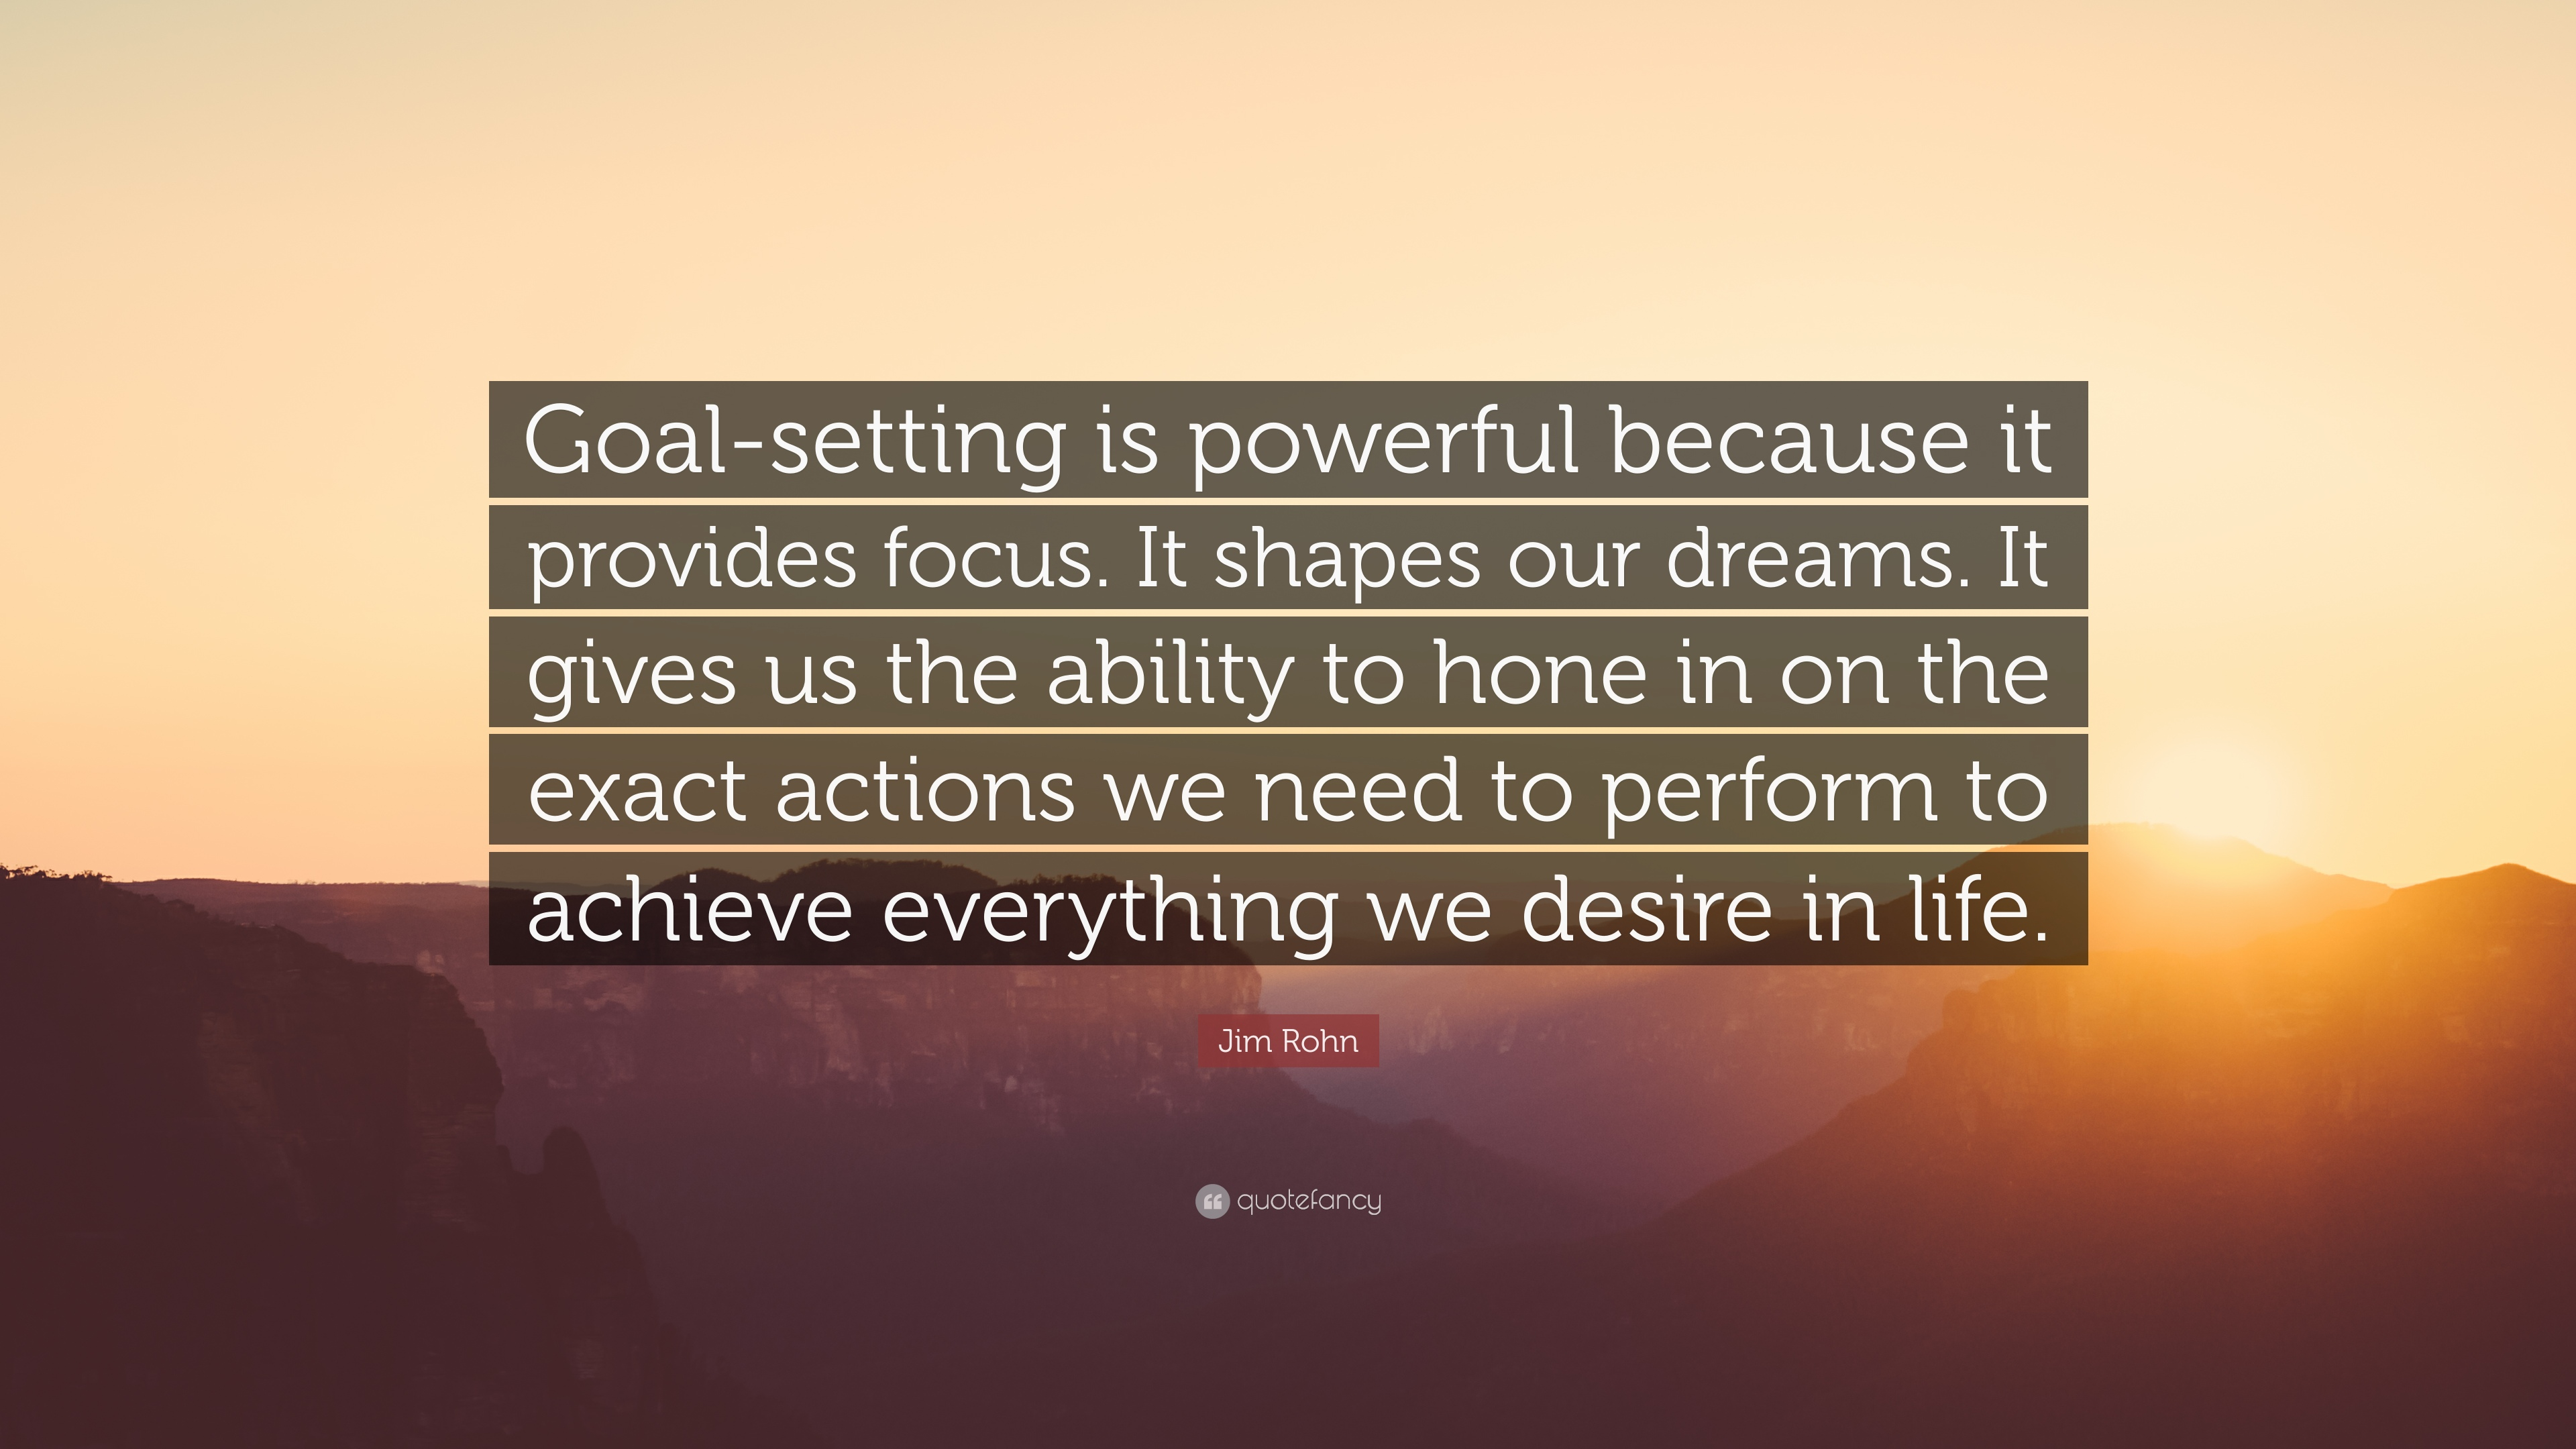 worksheet Jim Rohn Goal Setting Worksheet jim rohn goal setting worksheet 1 year success plan quote is powerful because it